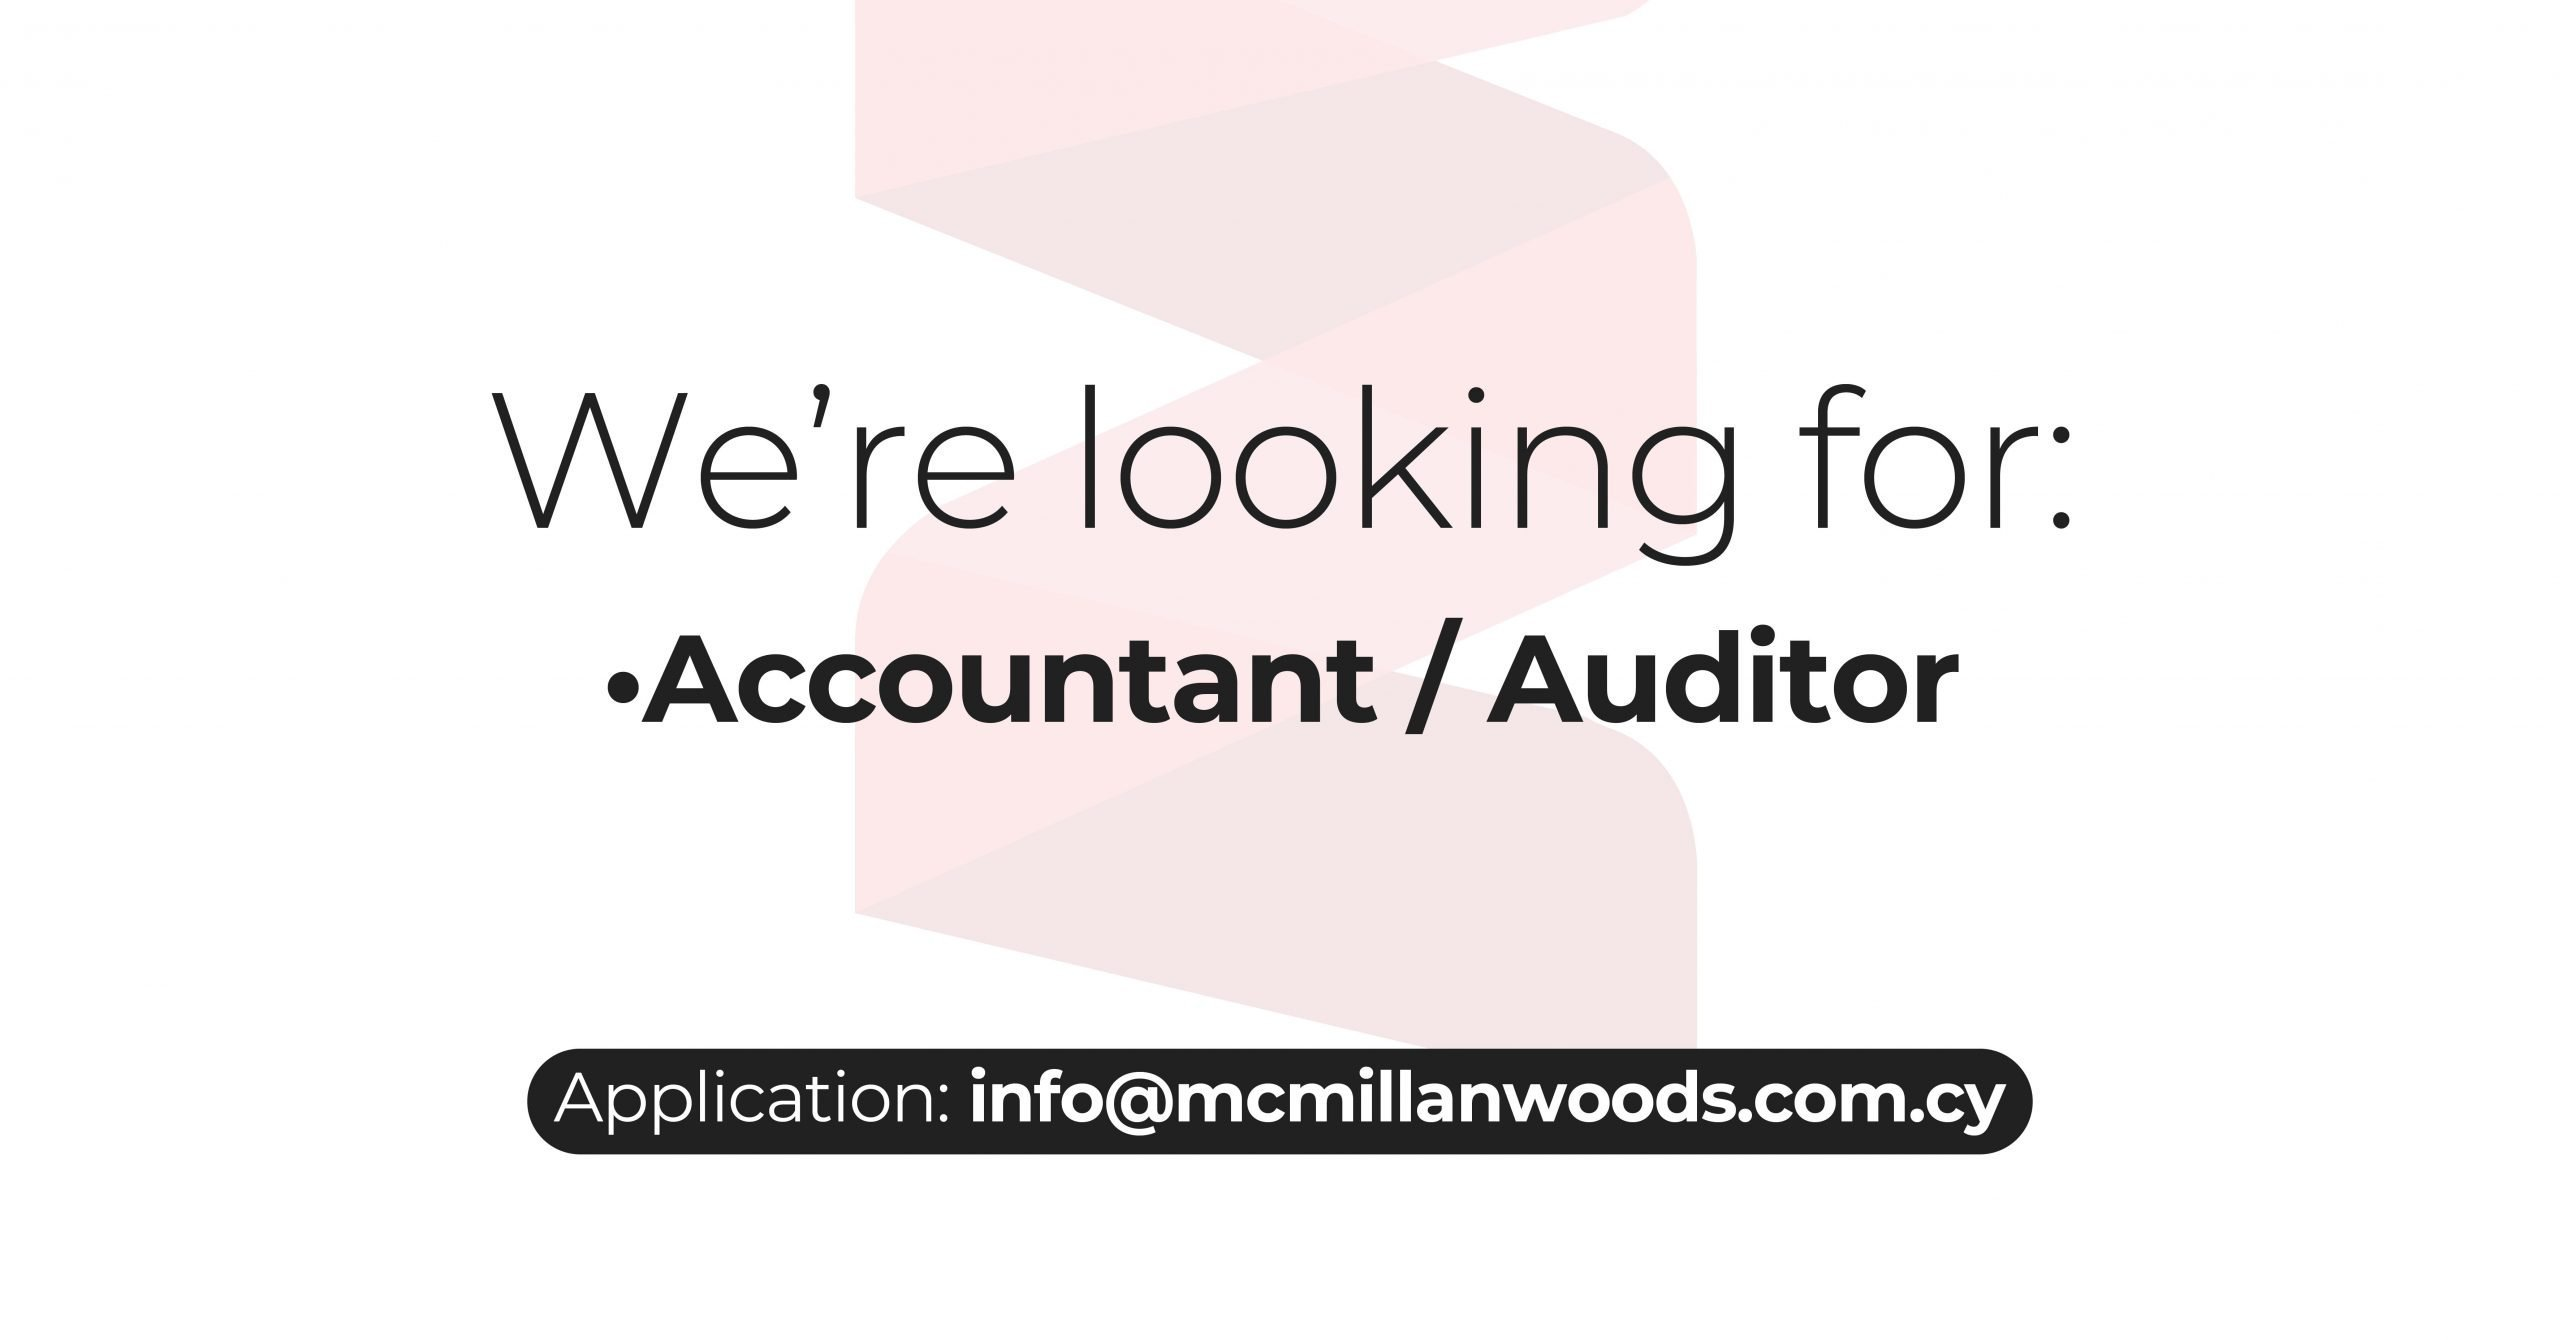 New Job Accountant - Auditor